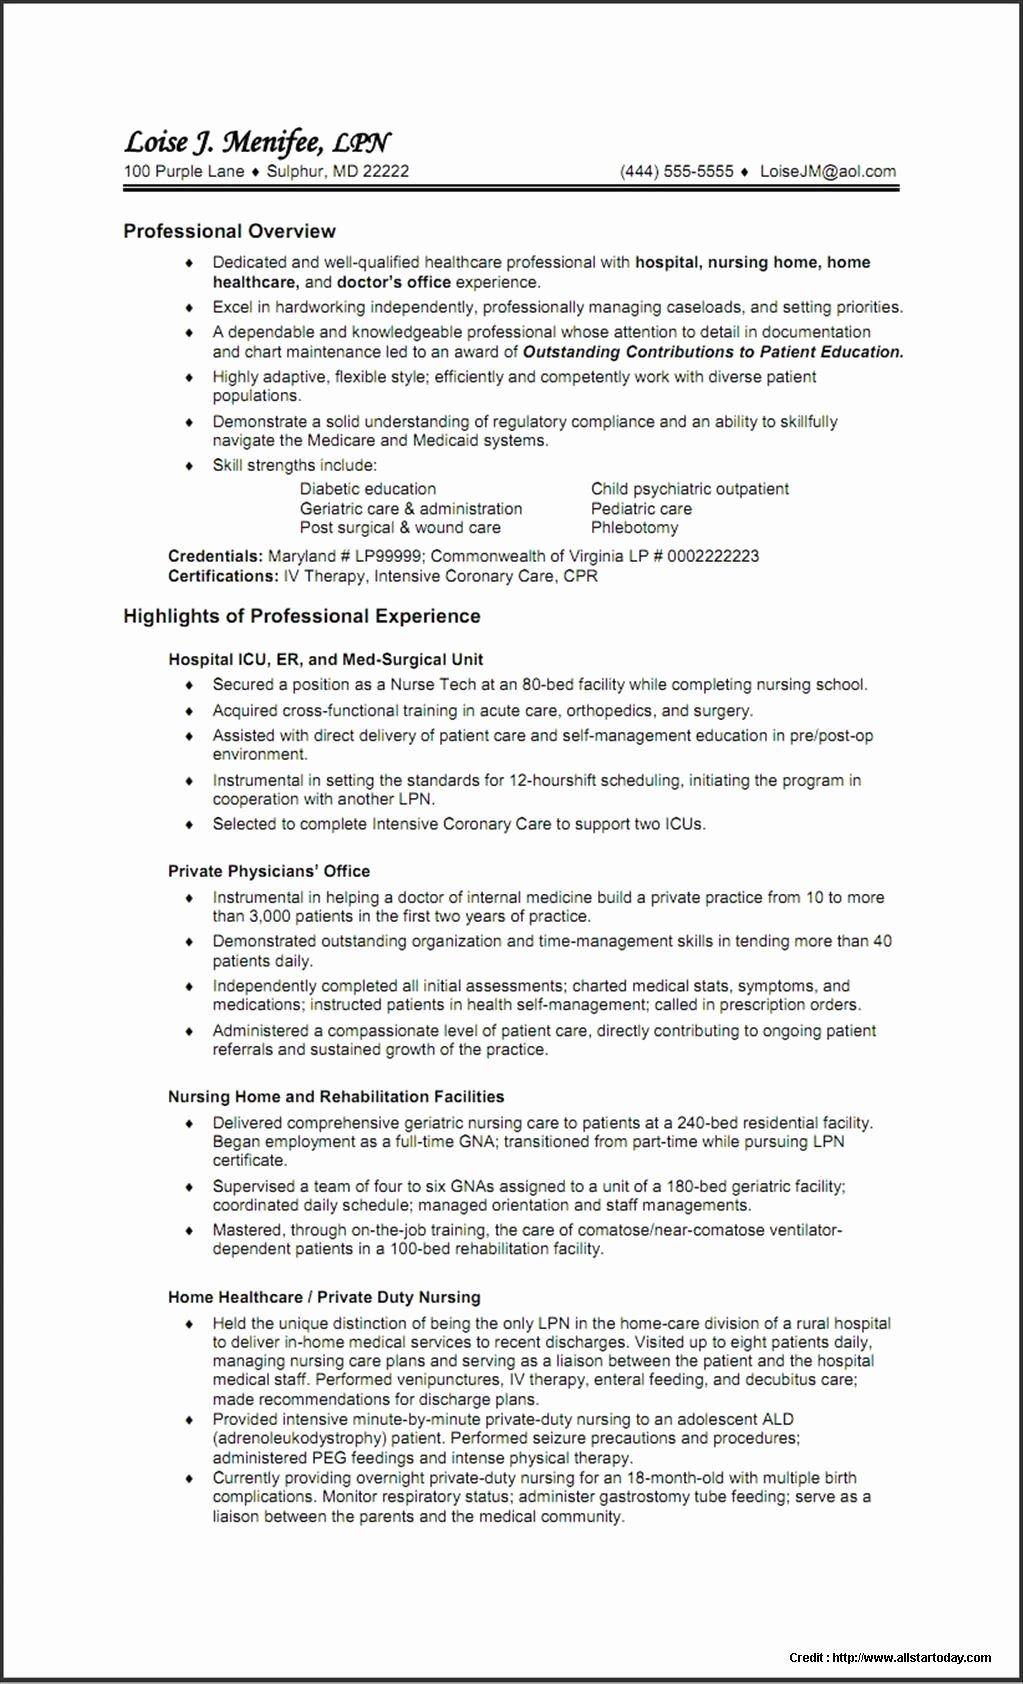 Resume Template for Nursing School Application Resume